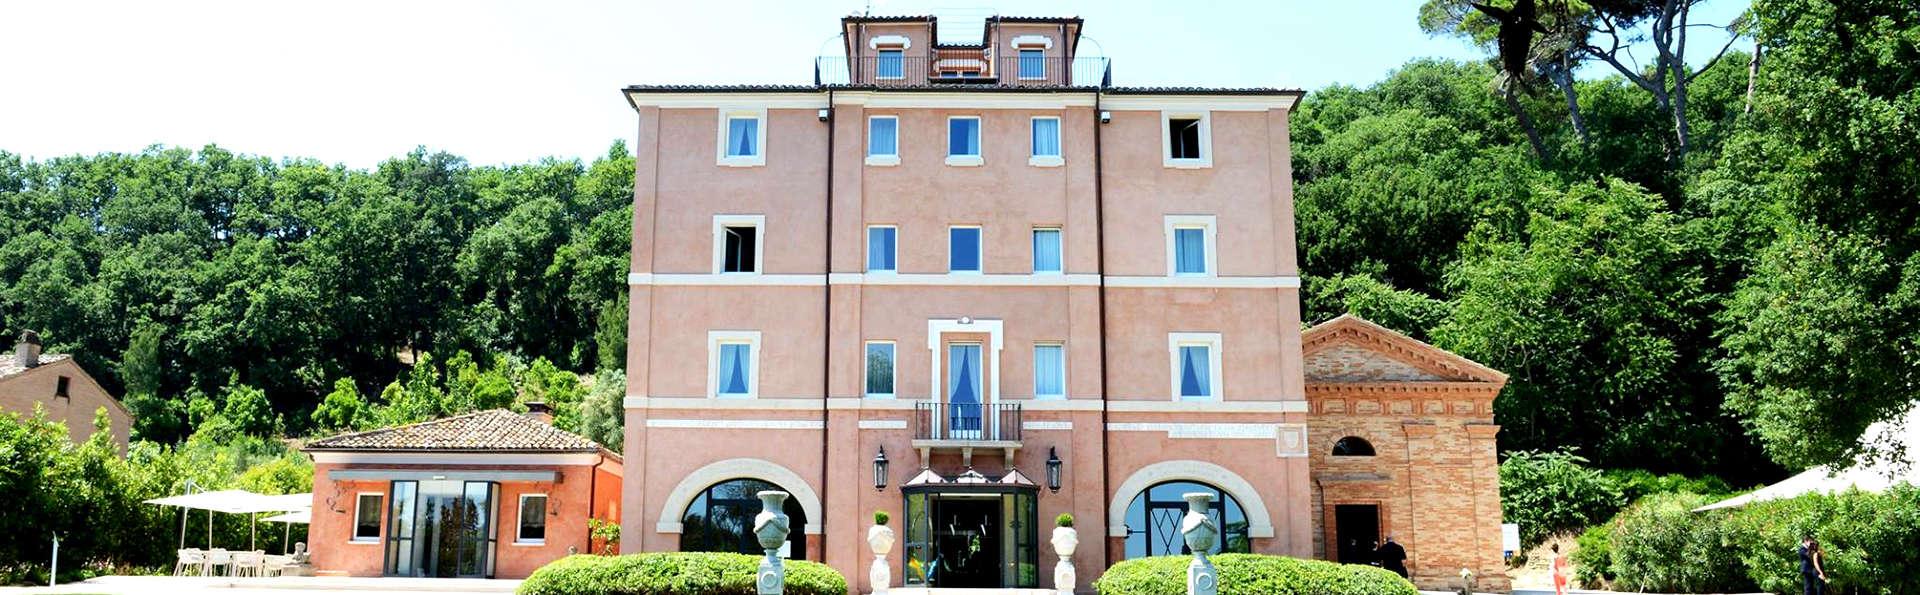 Villa Lattanzi - Edit_Front4.jpg